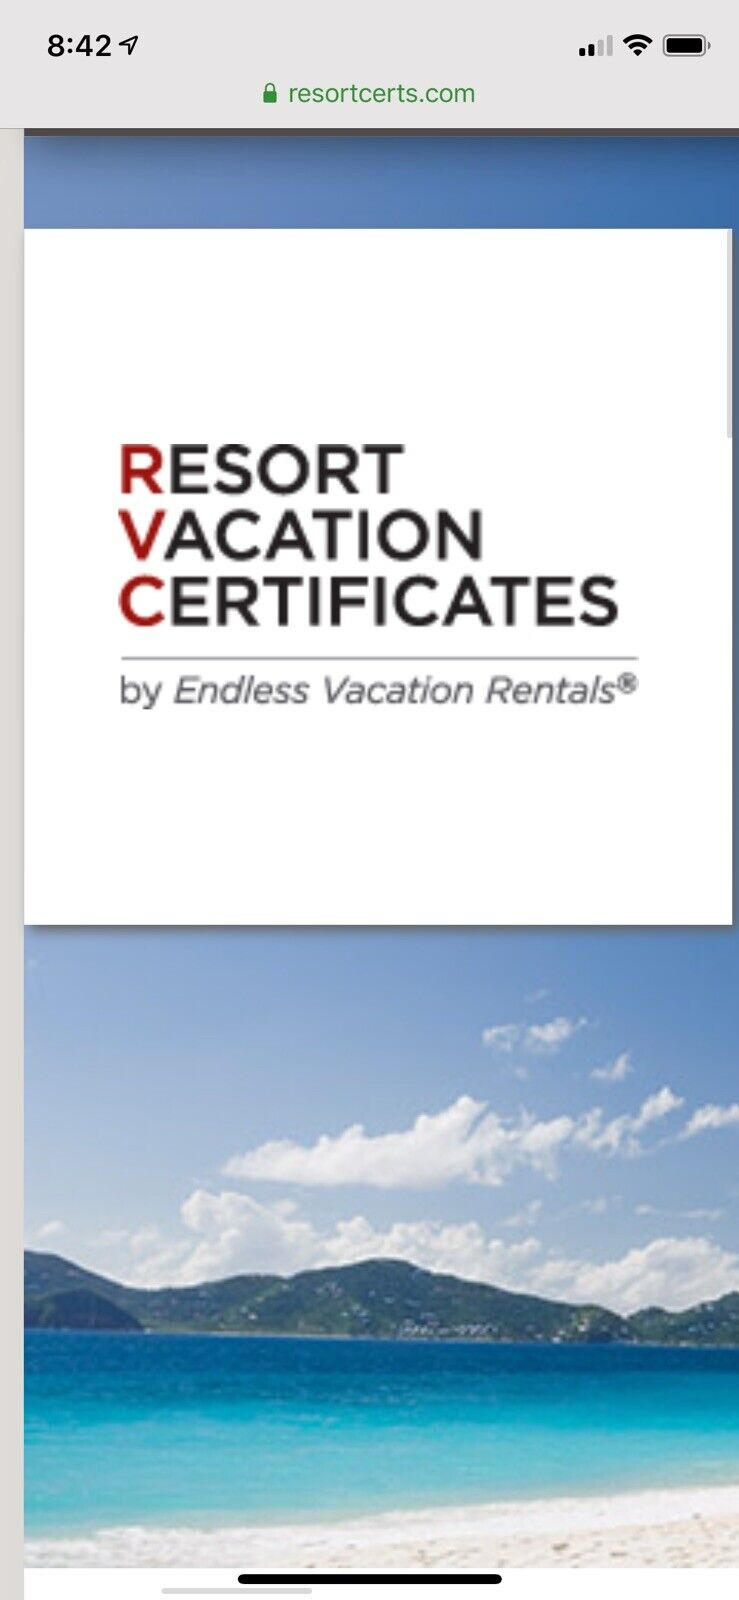 Resort Vacation Certificate around the World  7 Night Stay